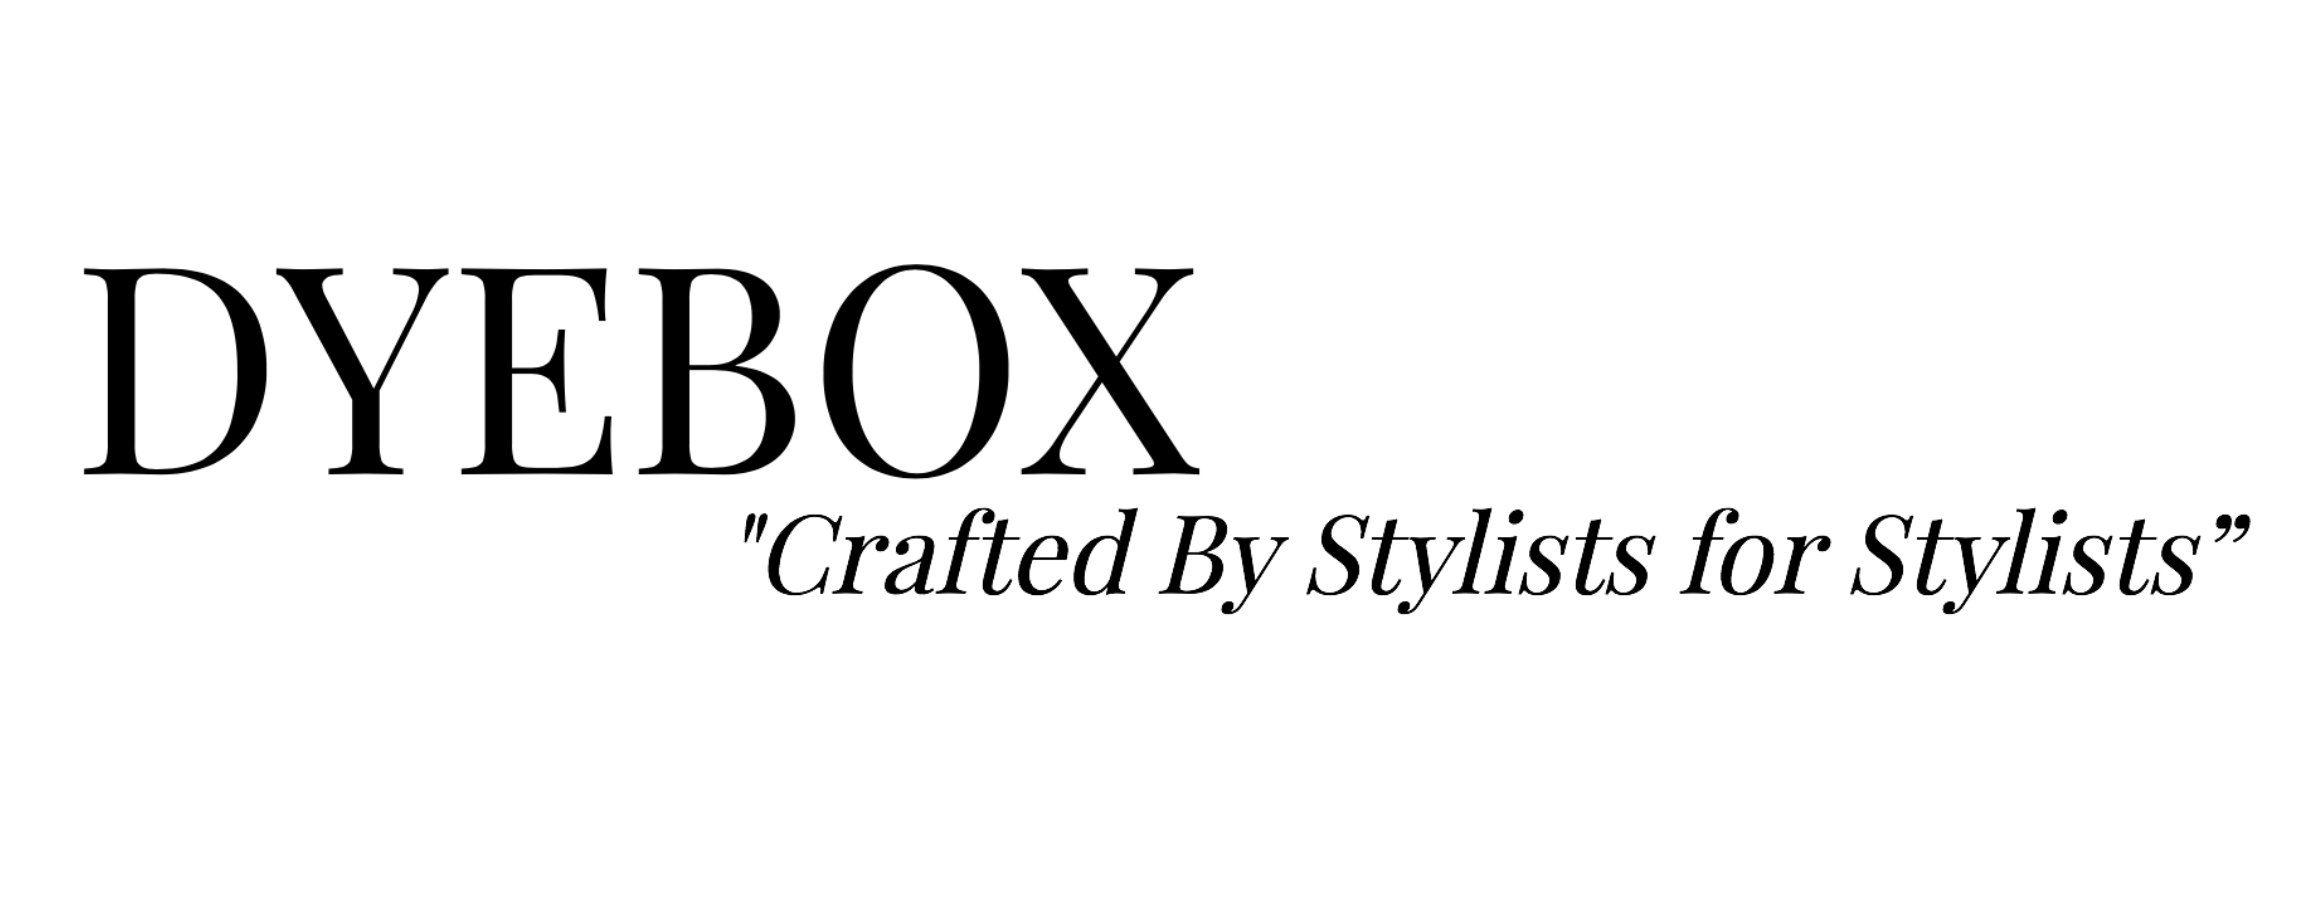 dyebox logo jpg.png